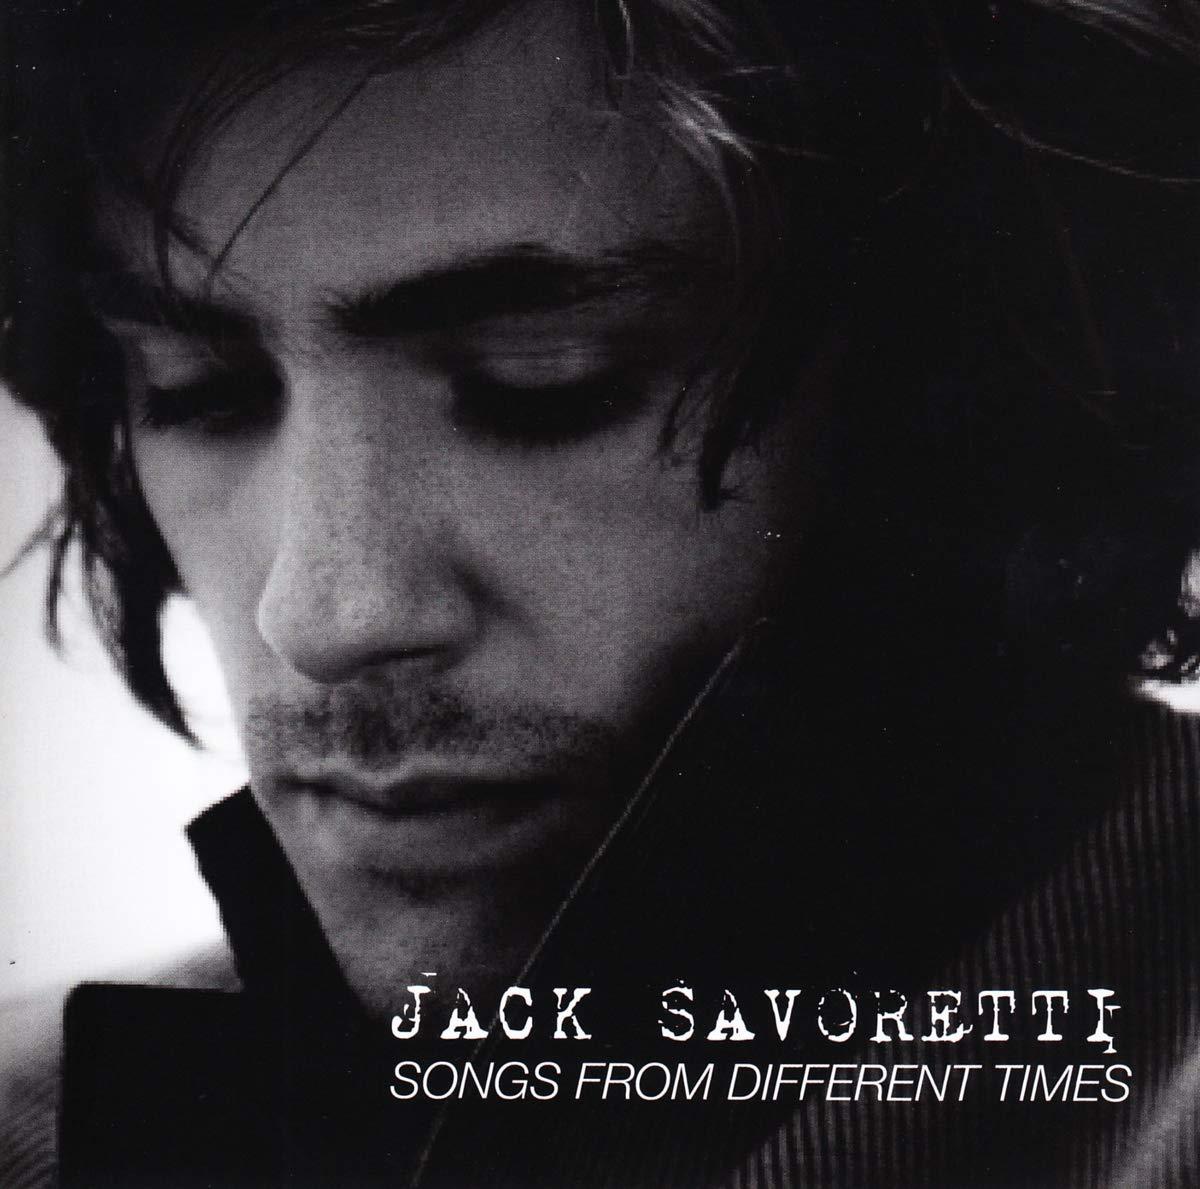 jack savoretti album kaufen